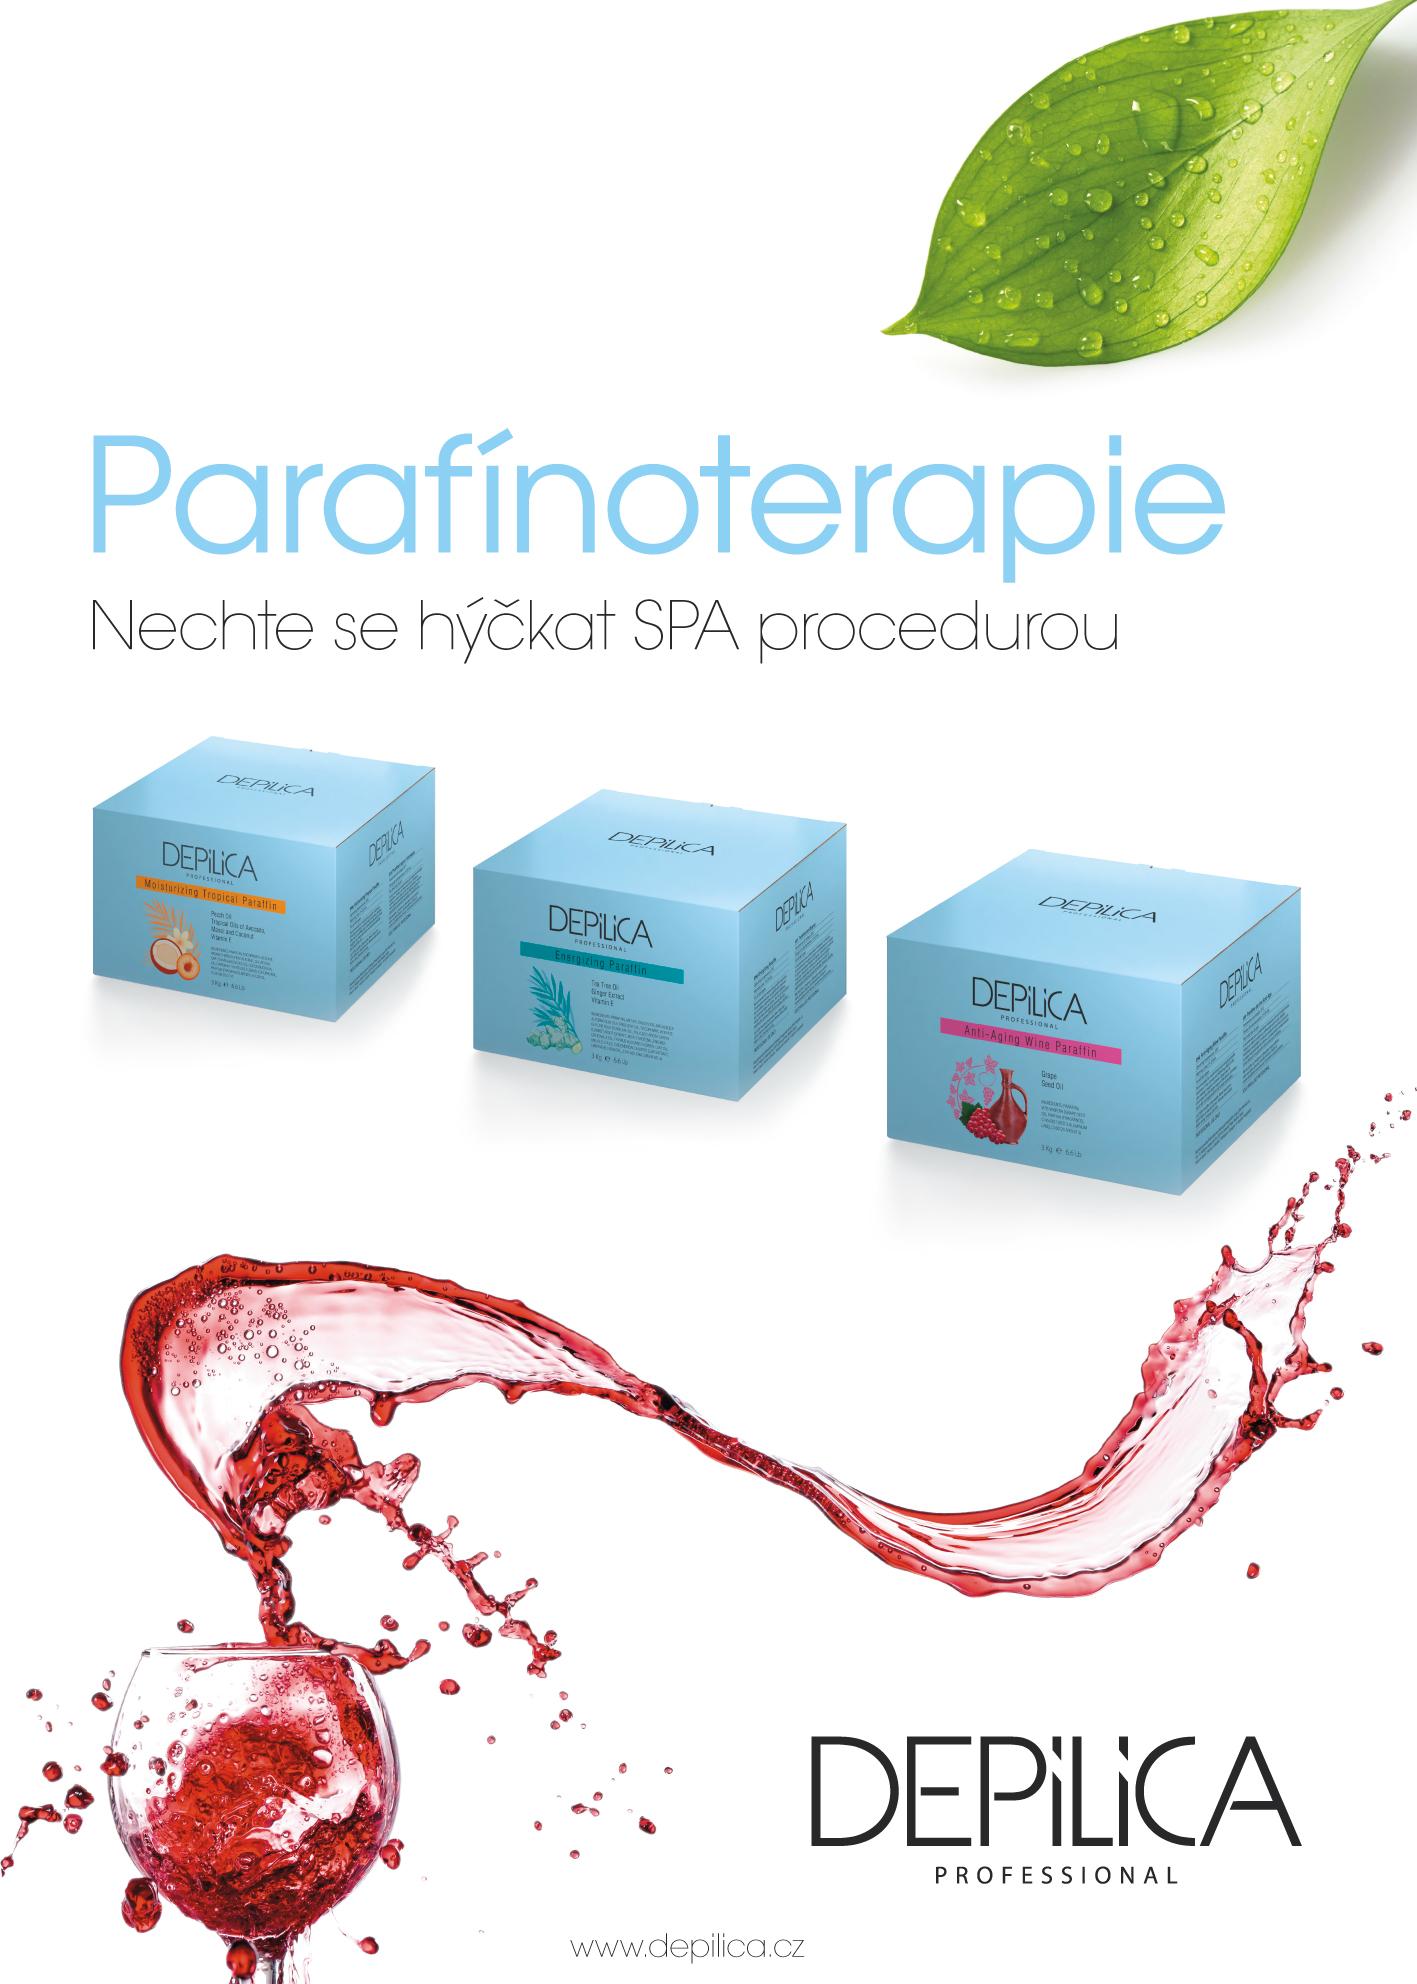 parafinoterapie_depilica_plakat